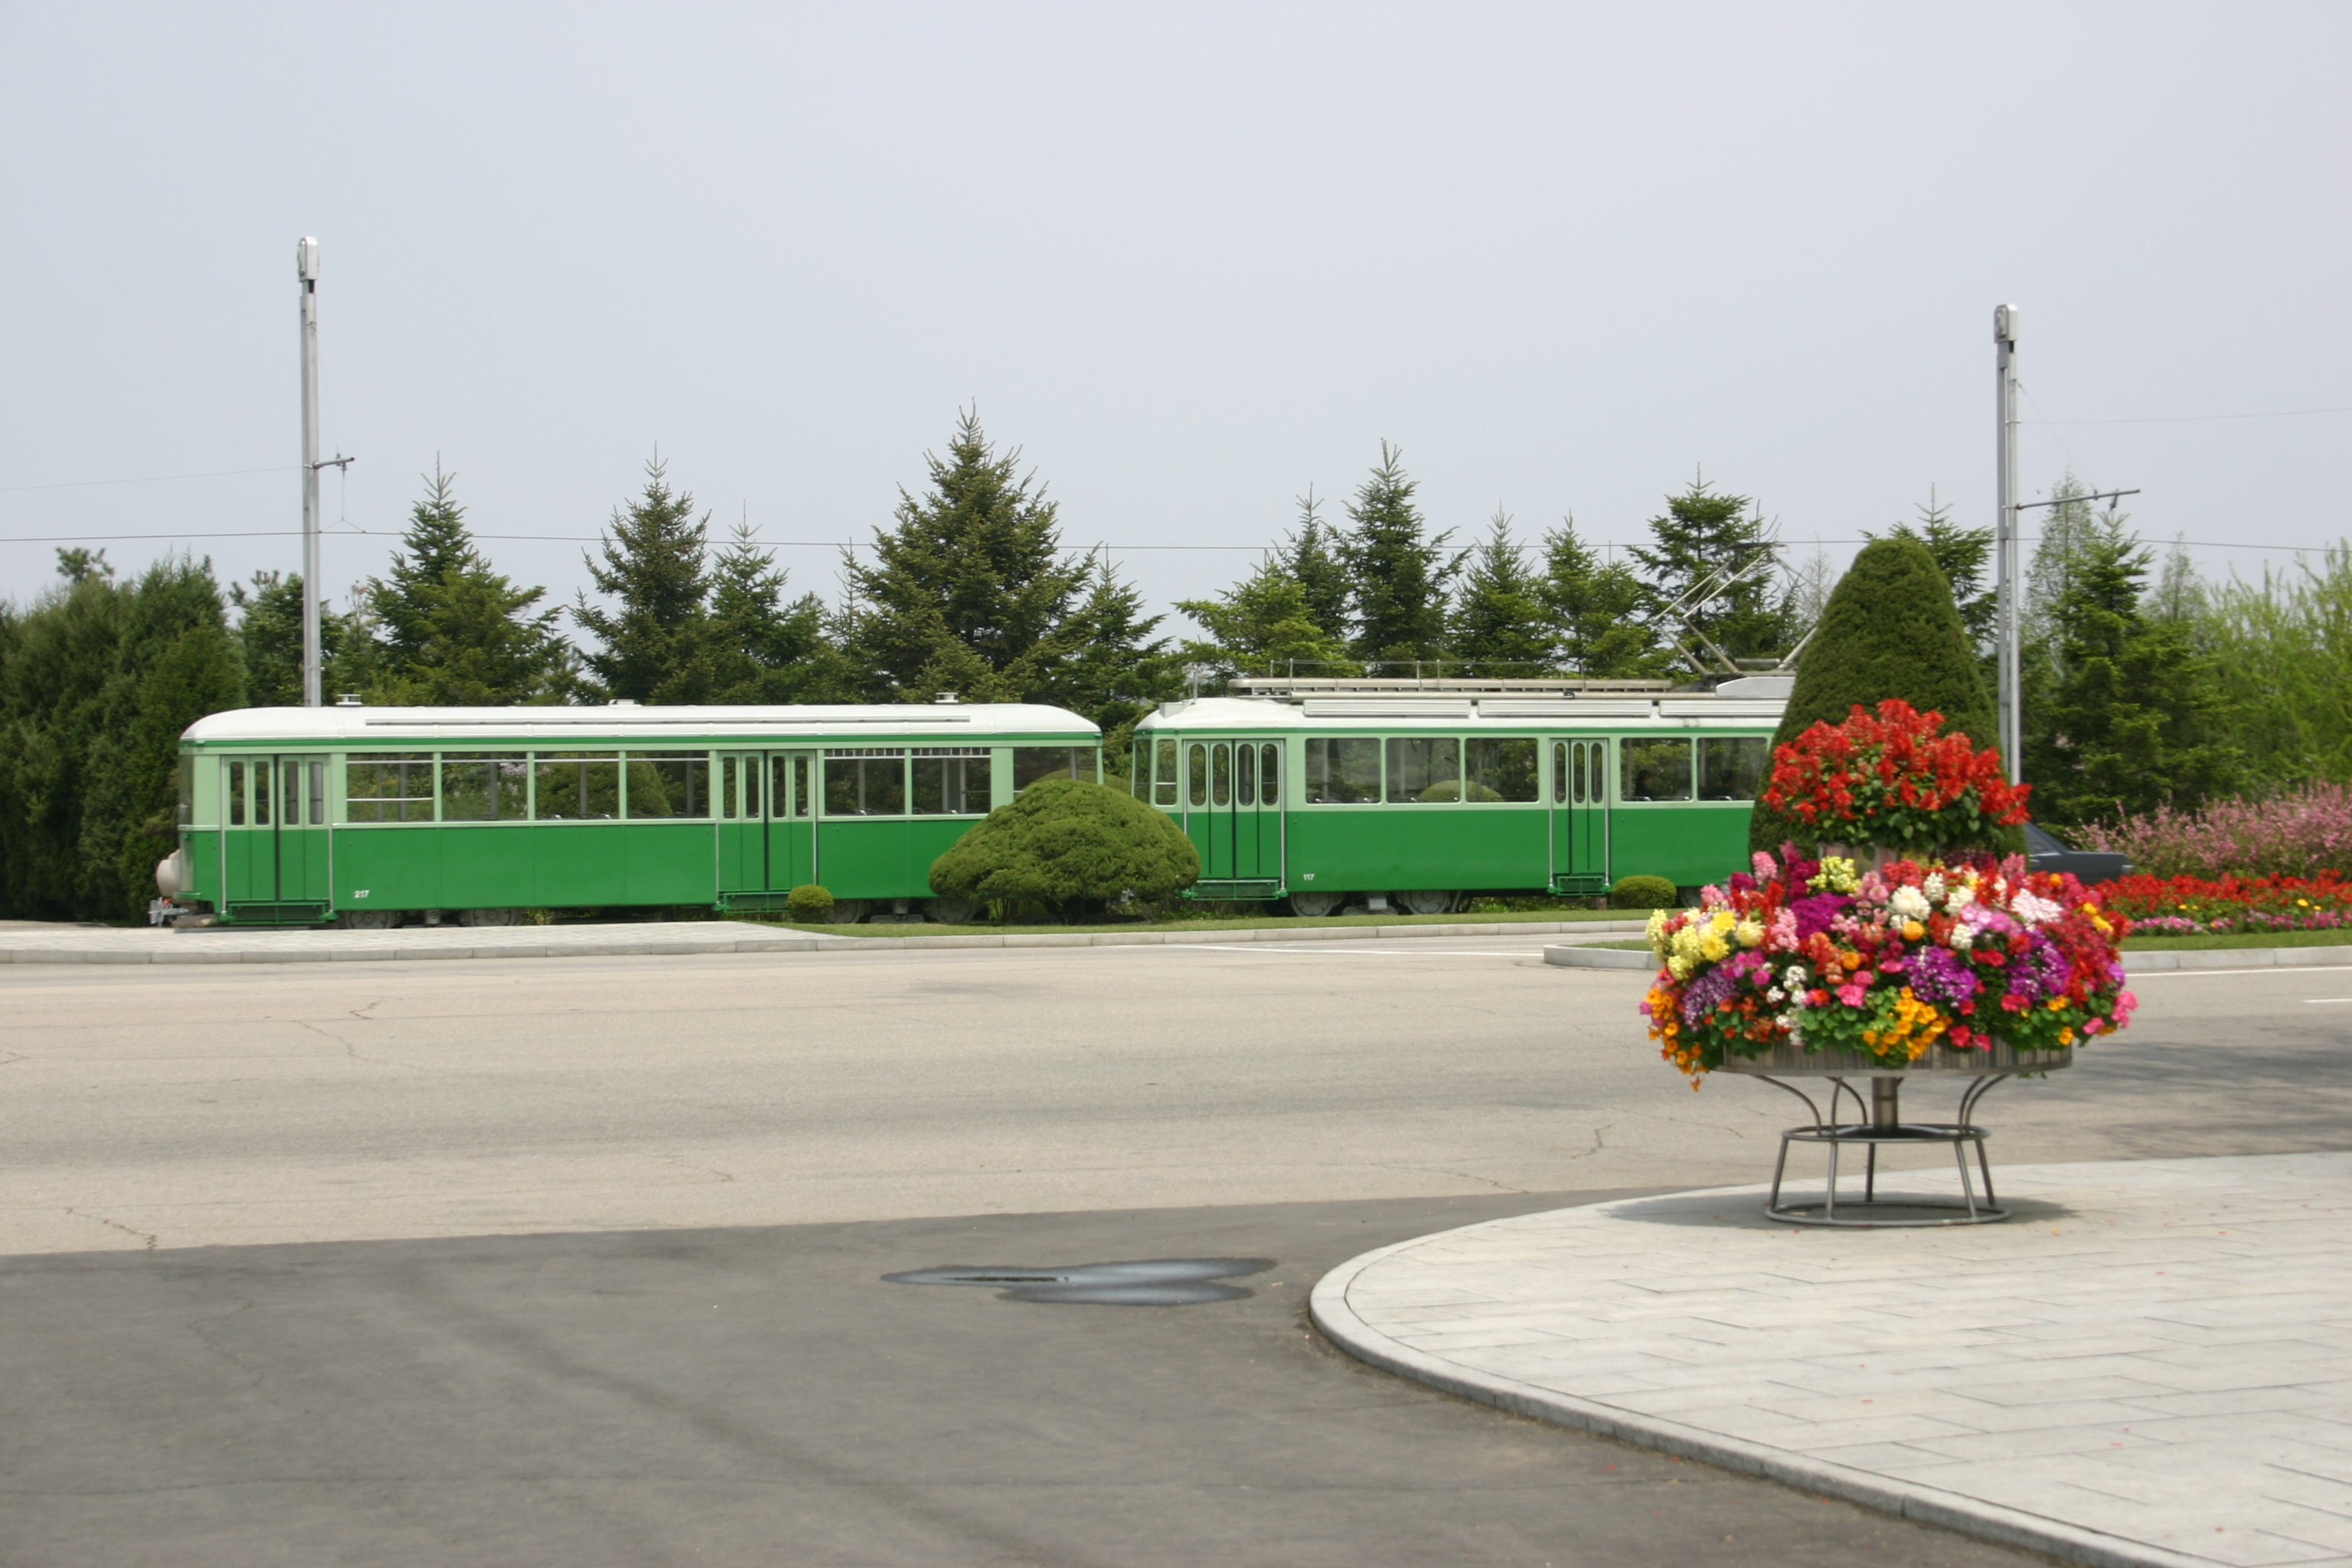 Tram North Korea PY